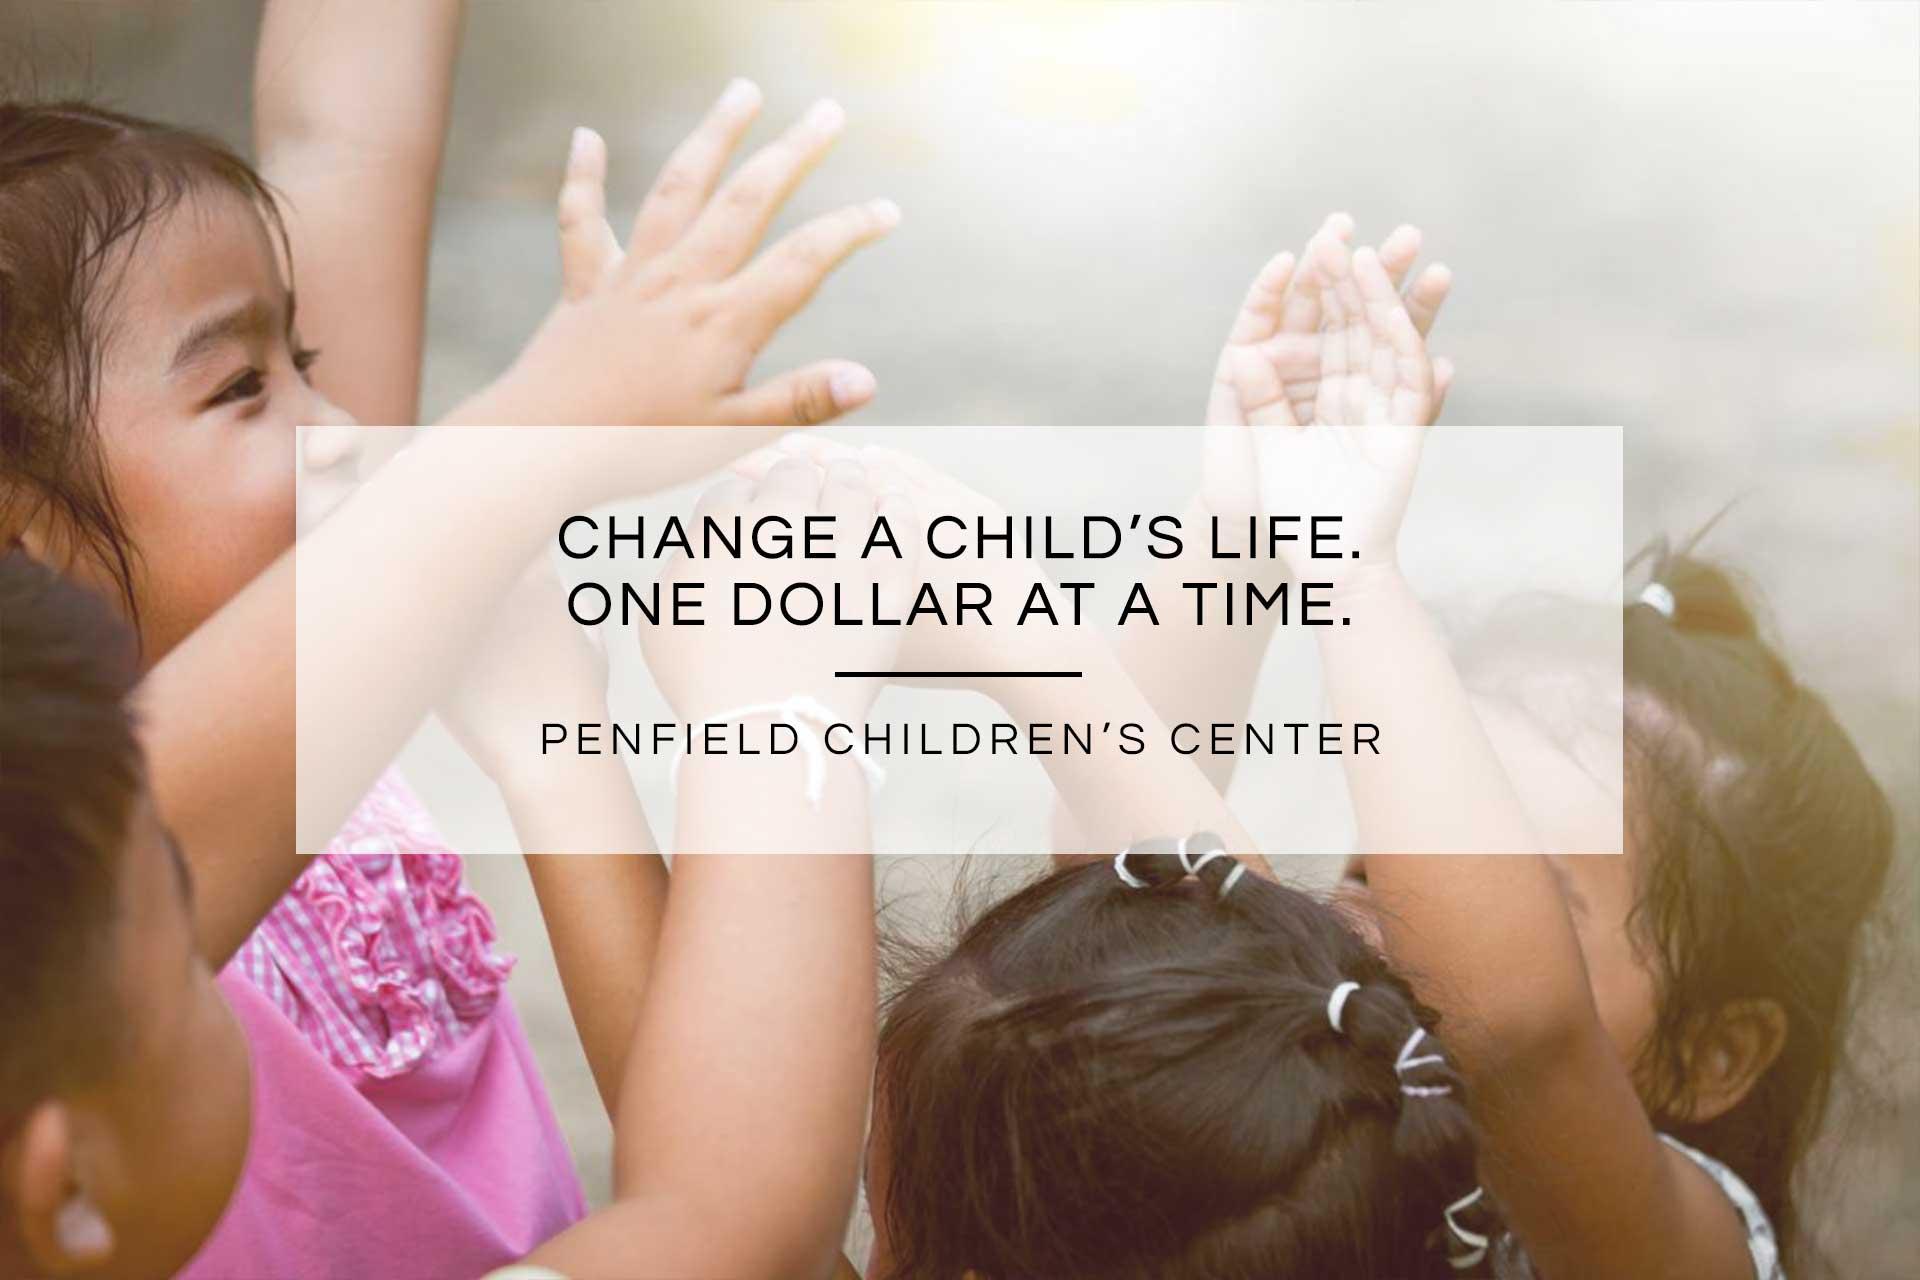 Change a Child's Life